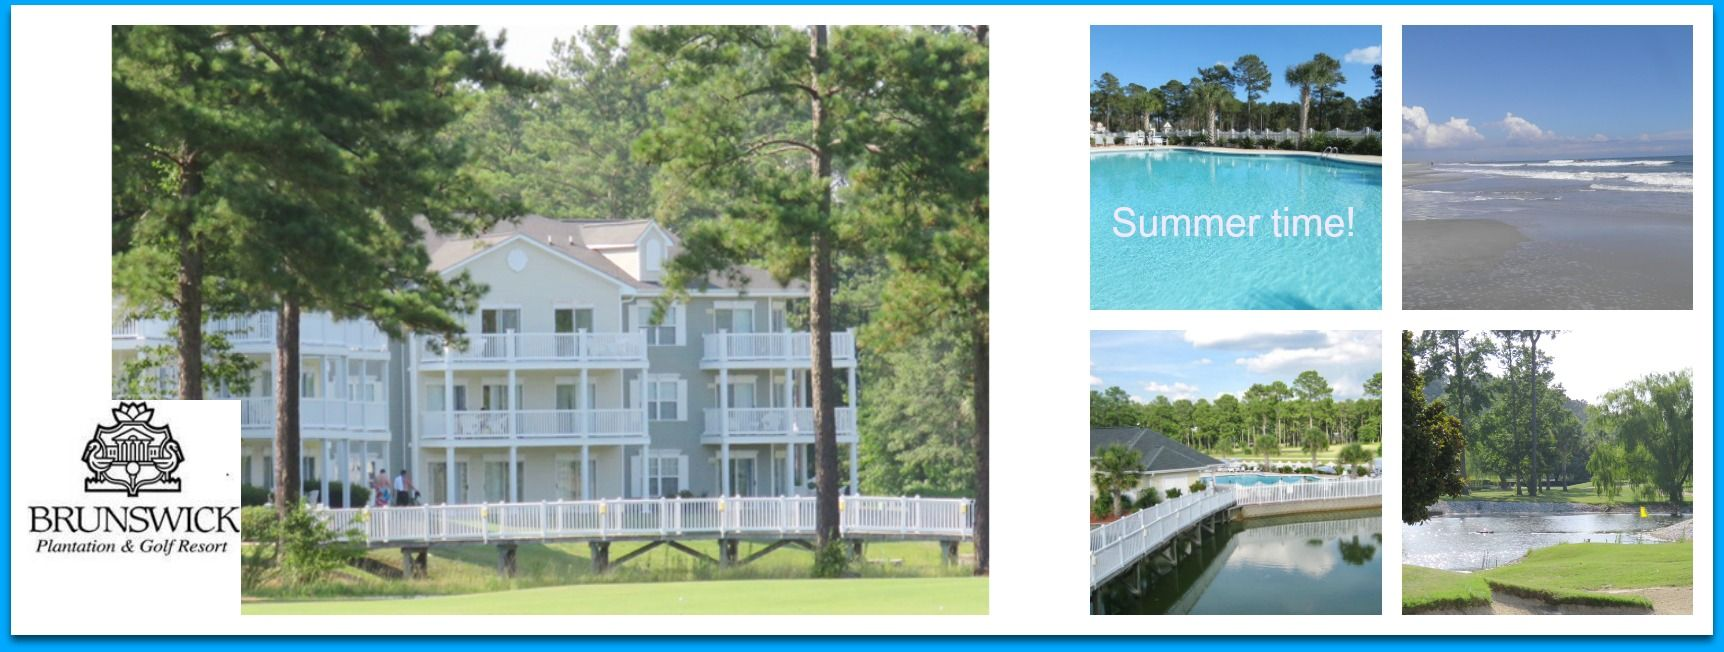 Summer Time at Brunswick Plantation & Golf Resort